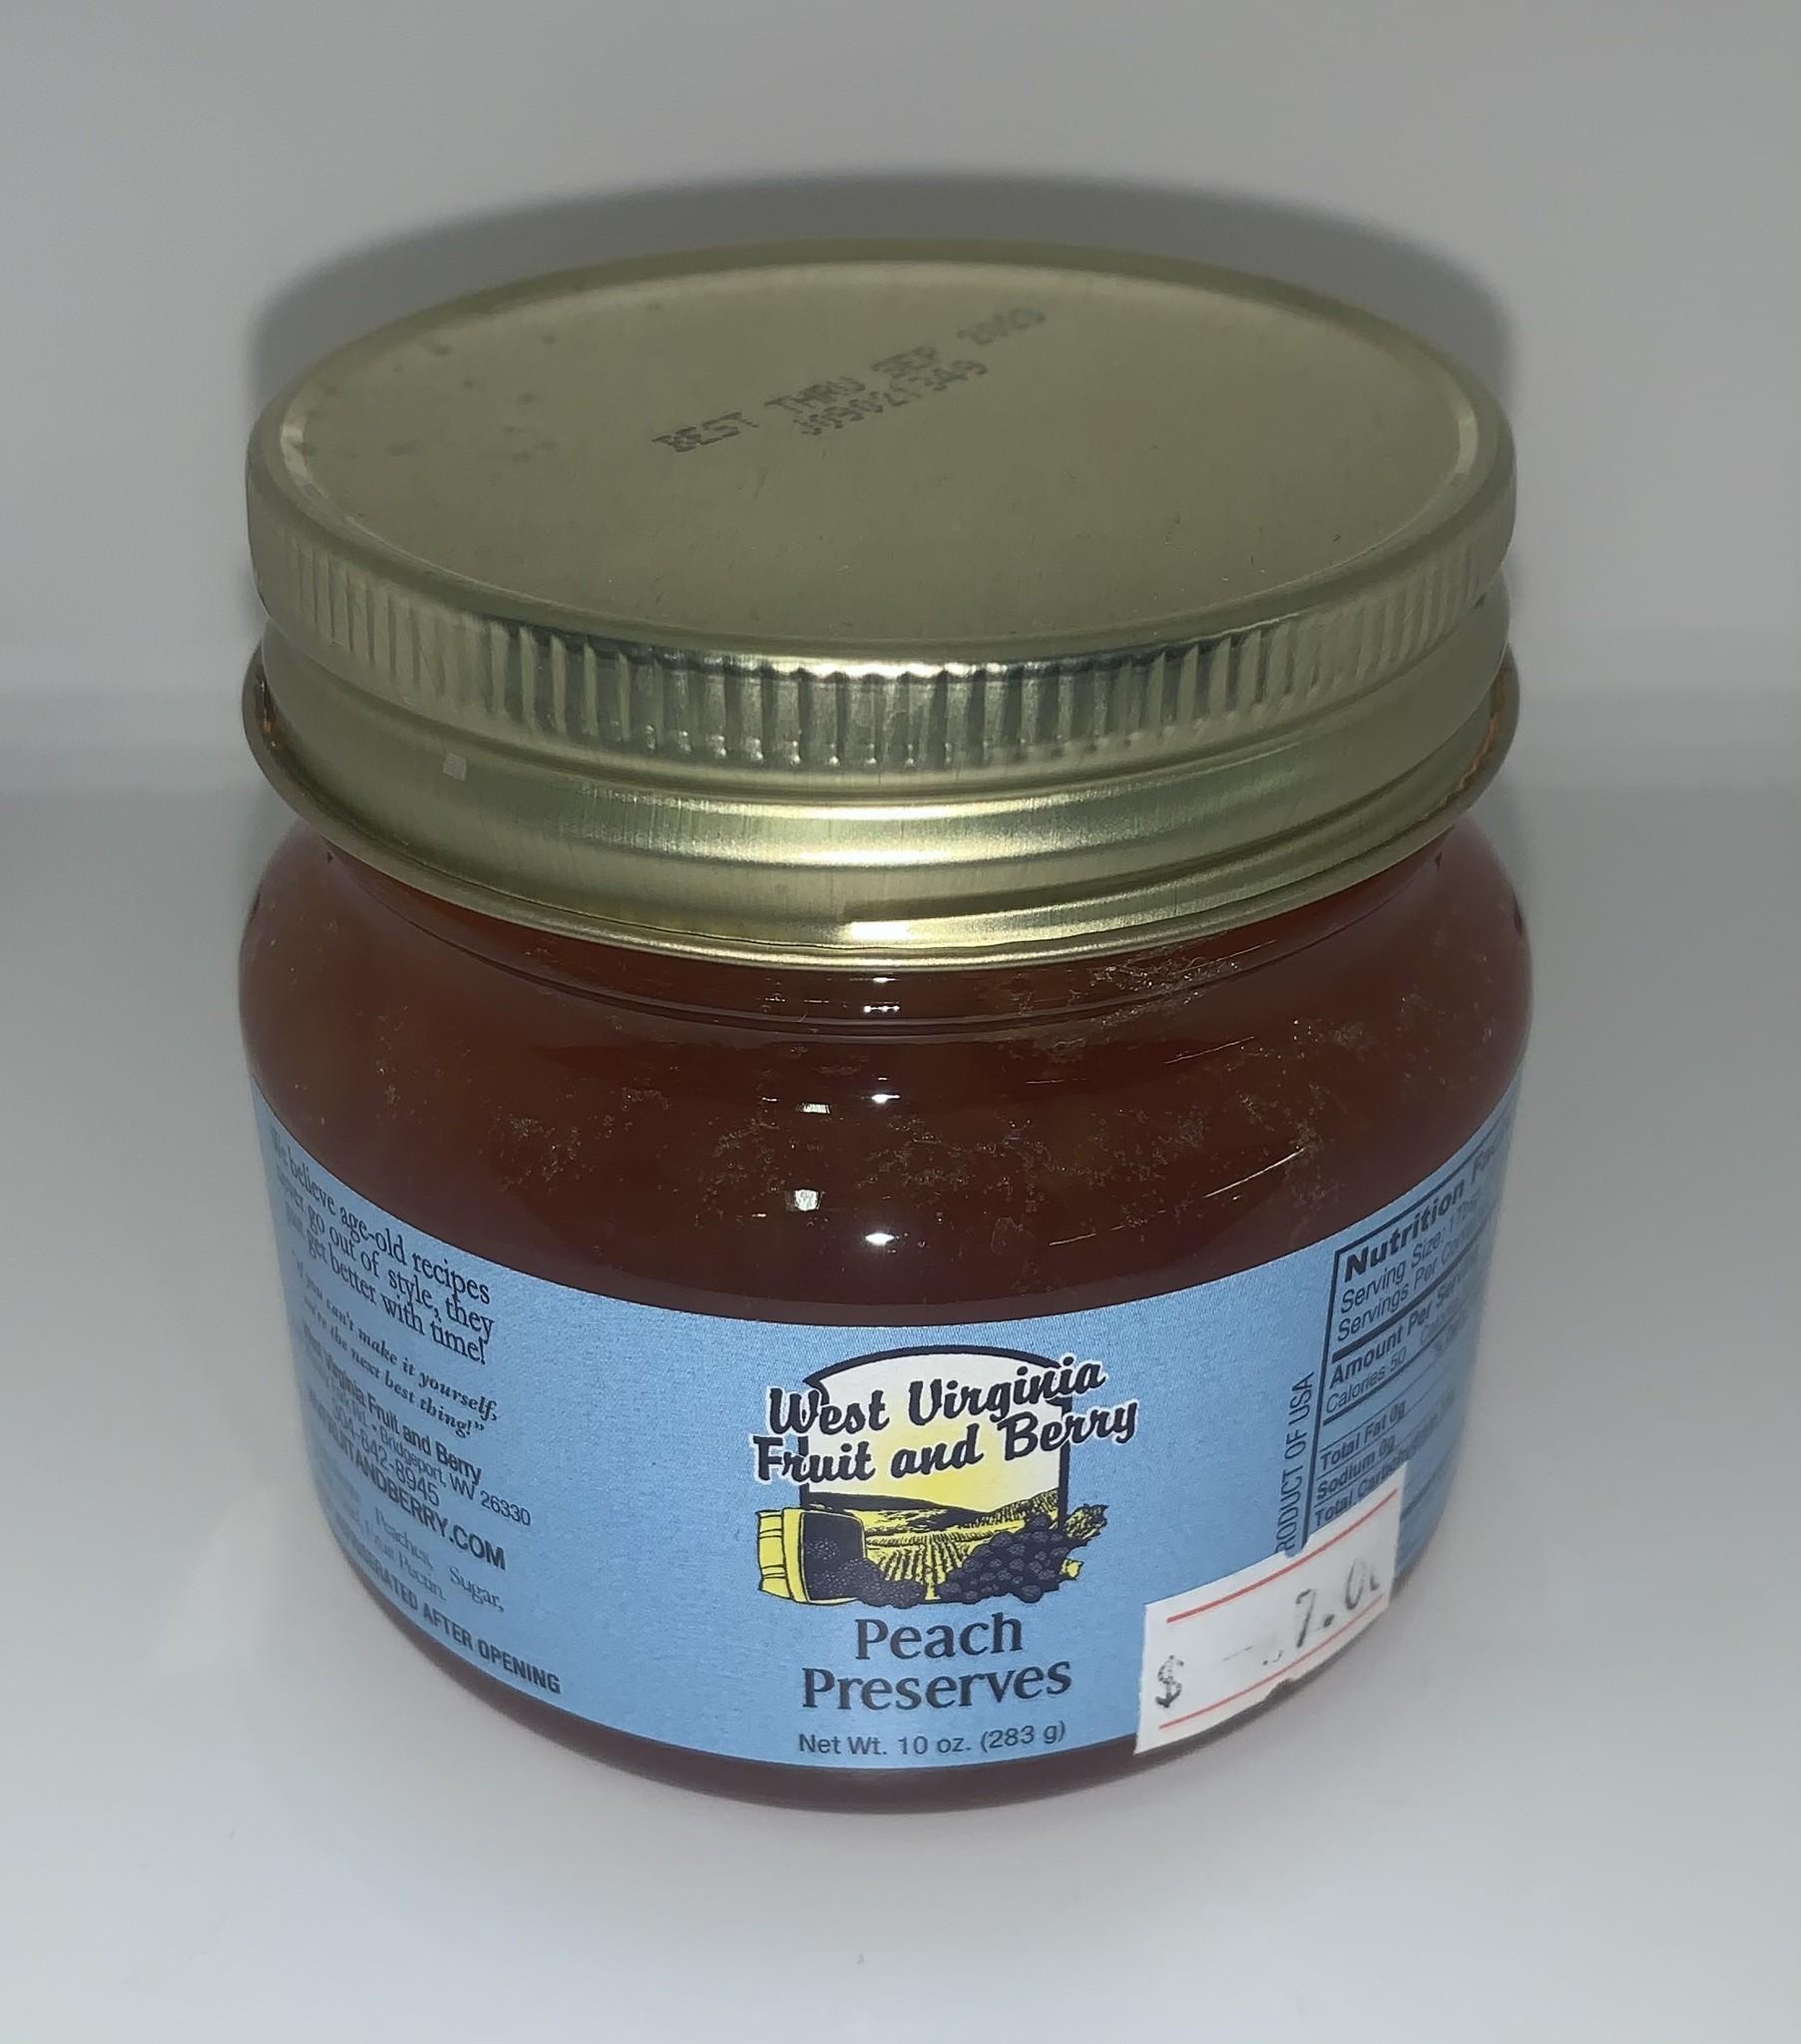 West Virginia Fruit and Berry WVF&B 10 oz. Peach Preserves